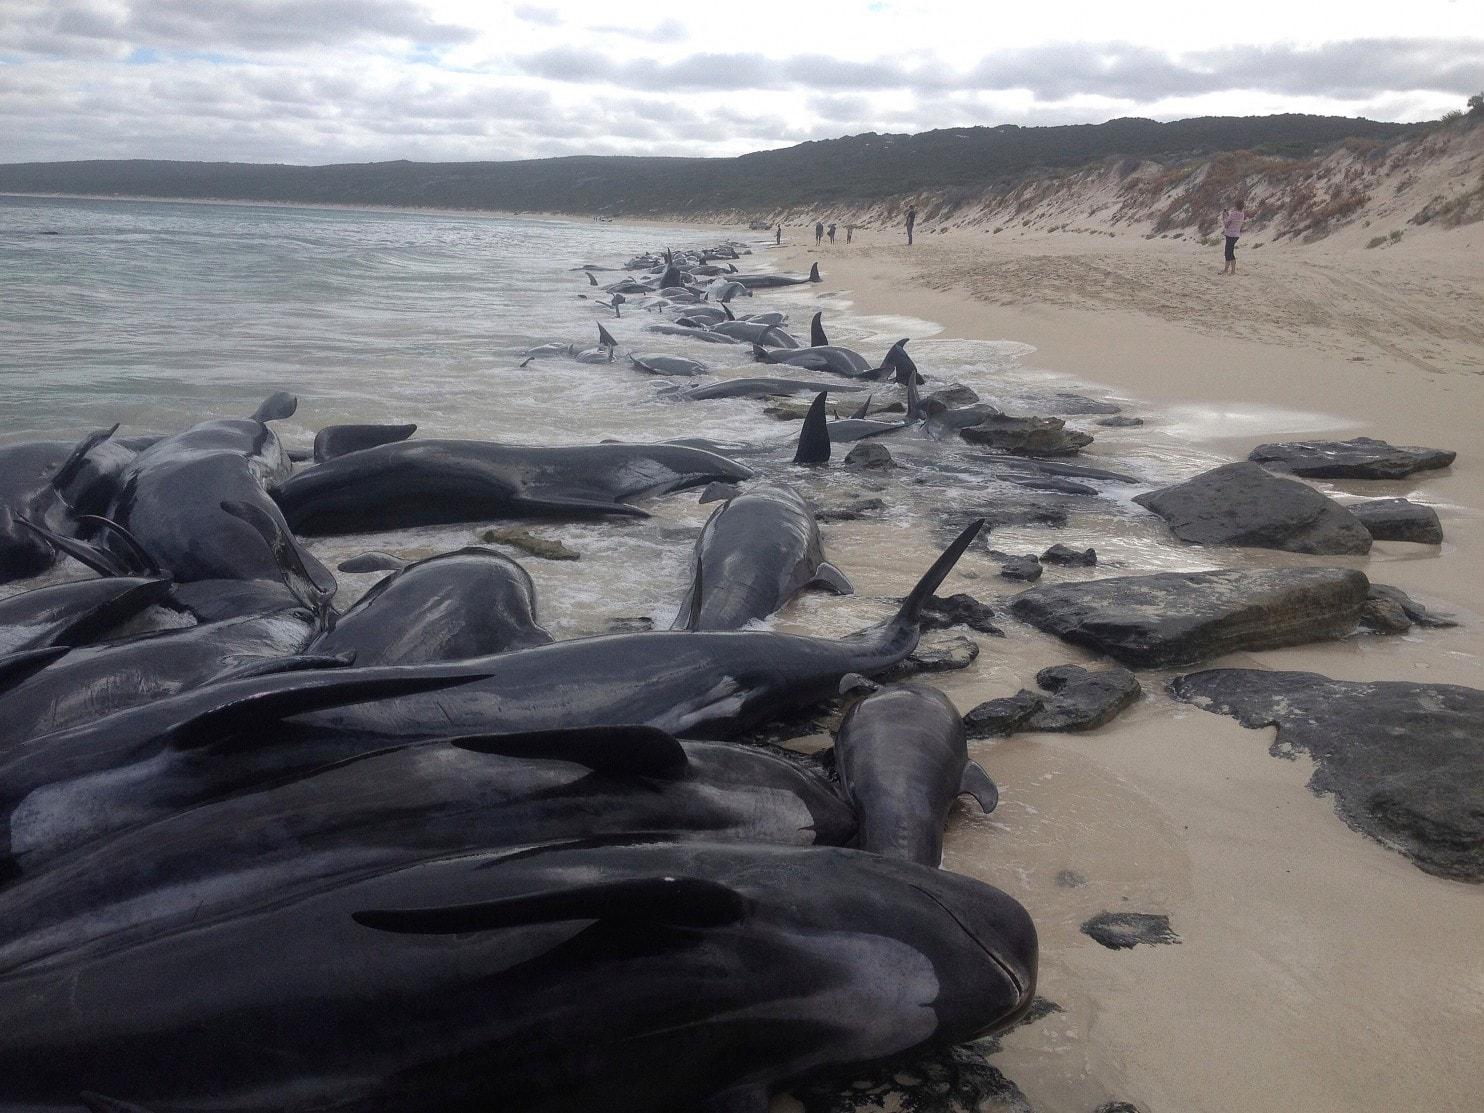 224997c85a4 Breaking News! 150 Whales Wash Ashore On Western Australian Beach  Shark  Warning Issued